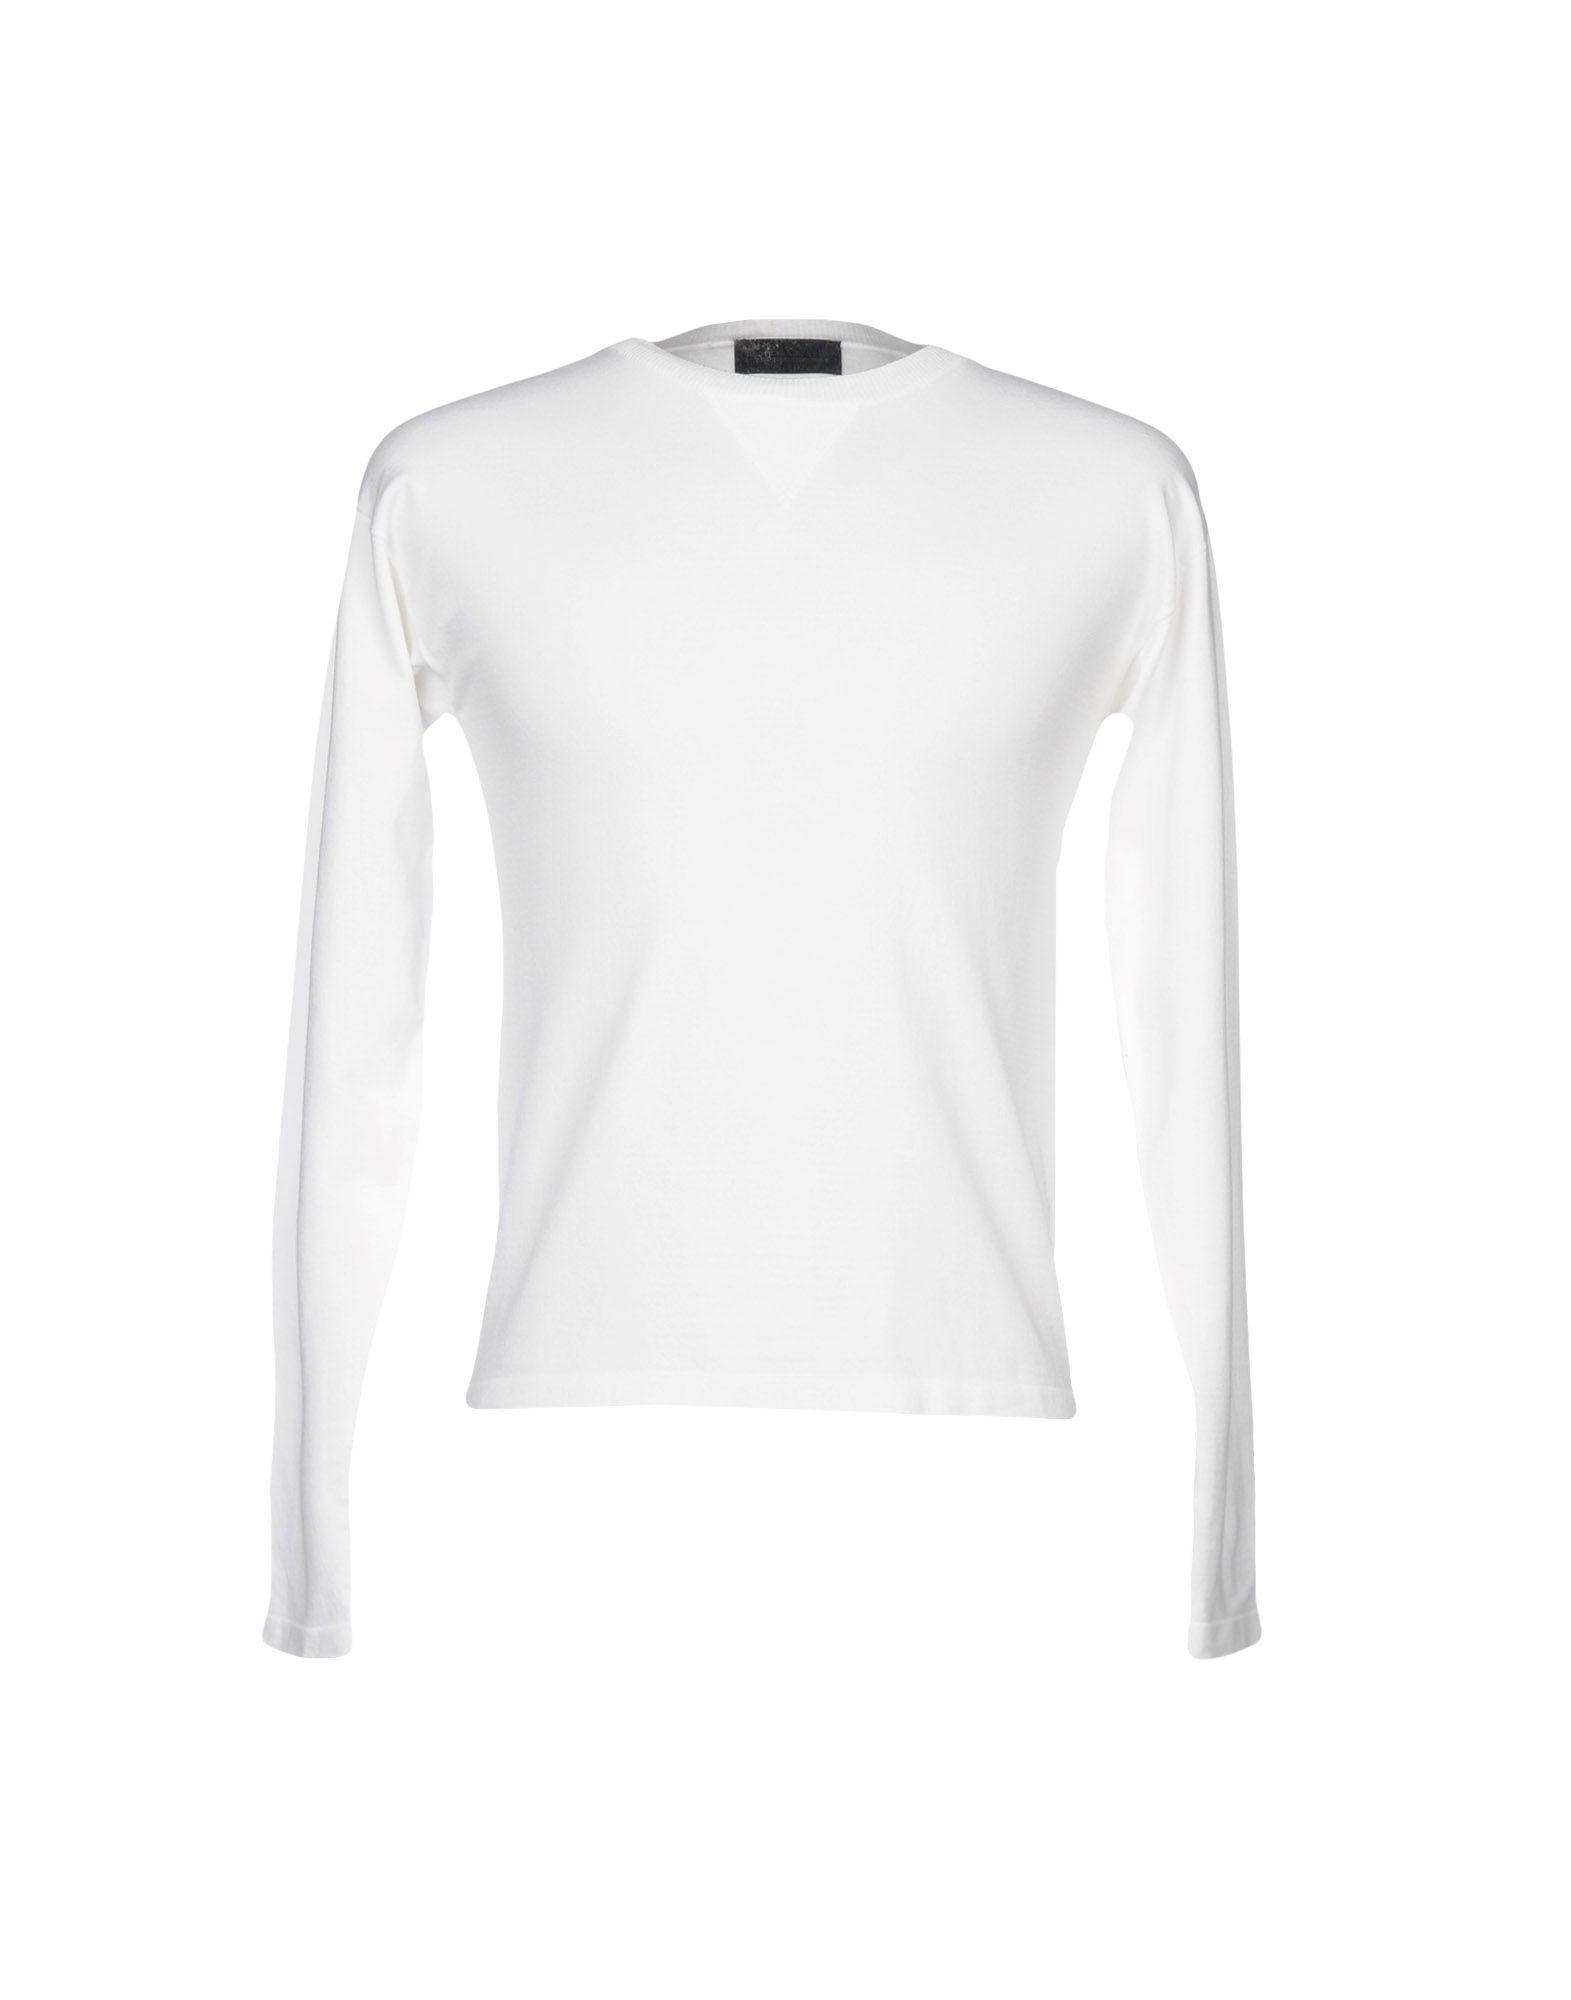 Diesel Black Gold Sweater In White